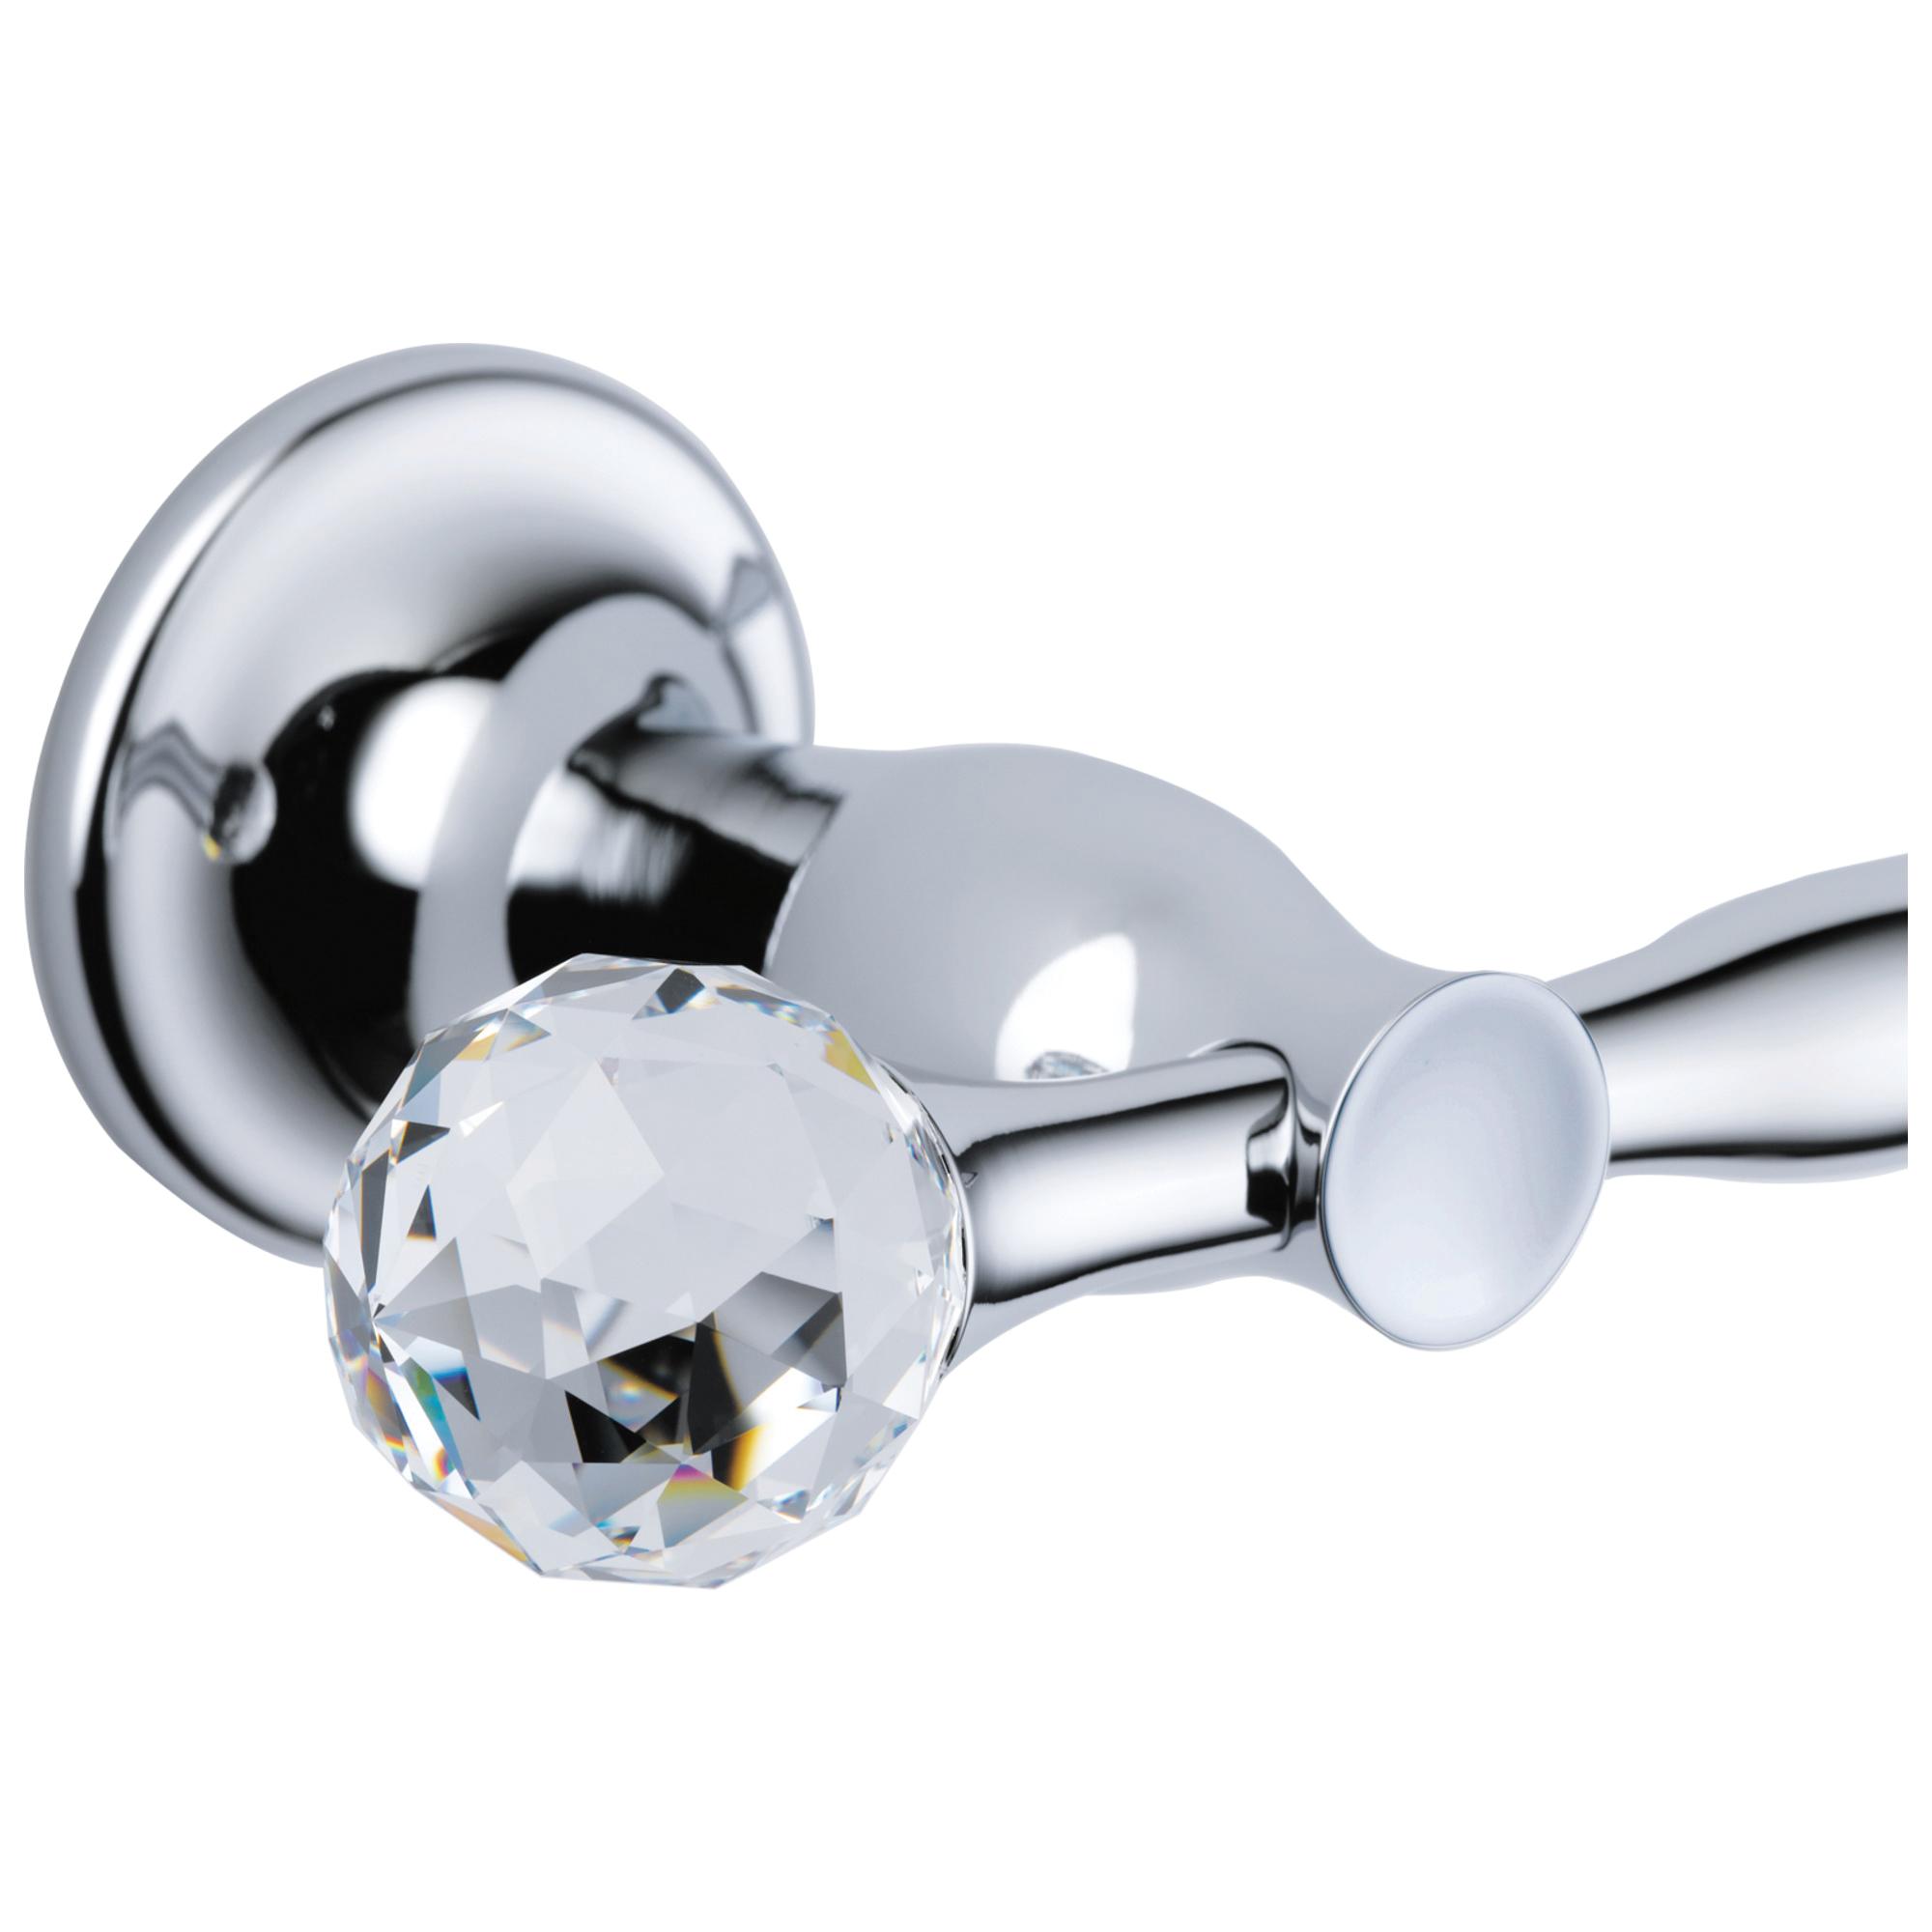 Brizo® RP48142PC Rsvp® Crystal Finial, Plastic, Polished Chrome, Import